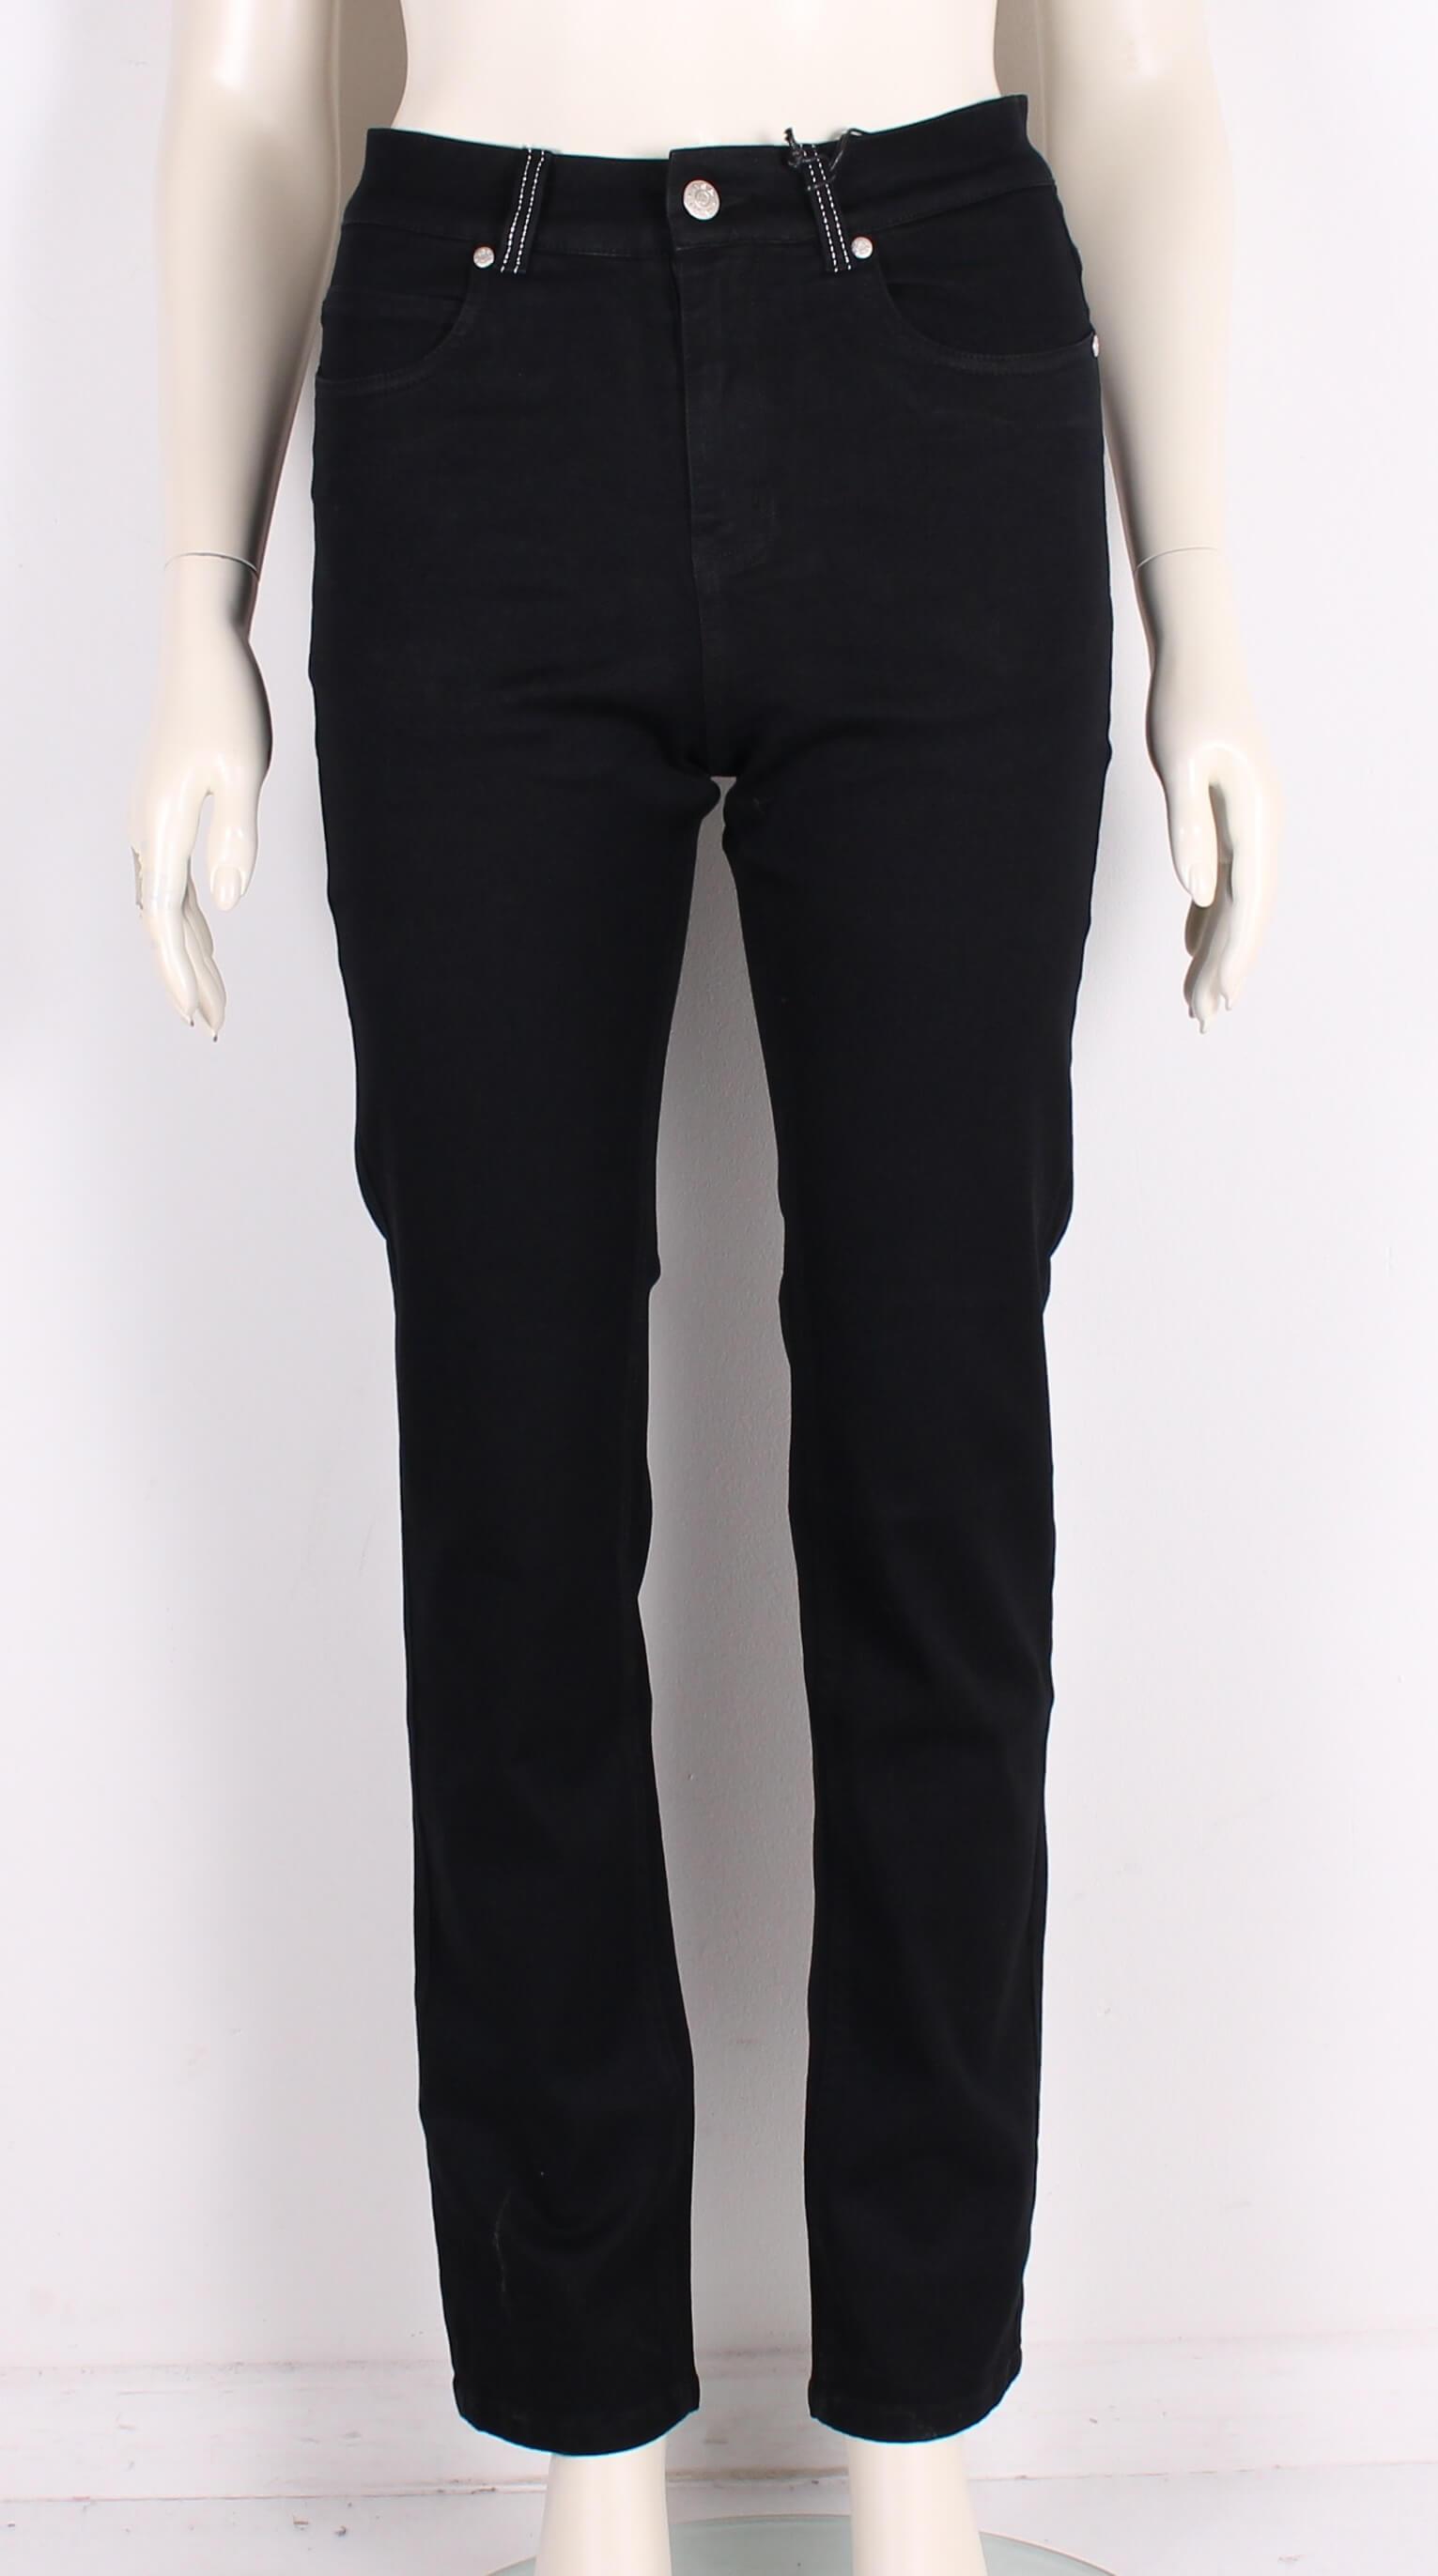 ASP – Smarte Net Dame Jeans m. høj talje – Sort